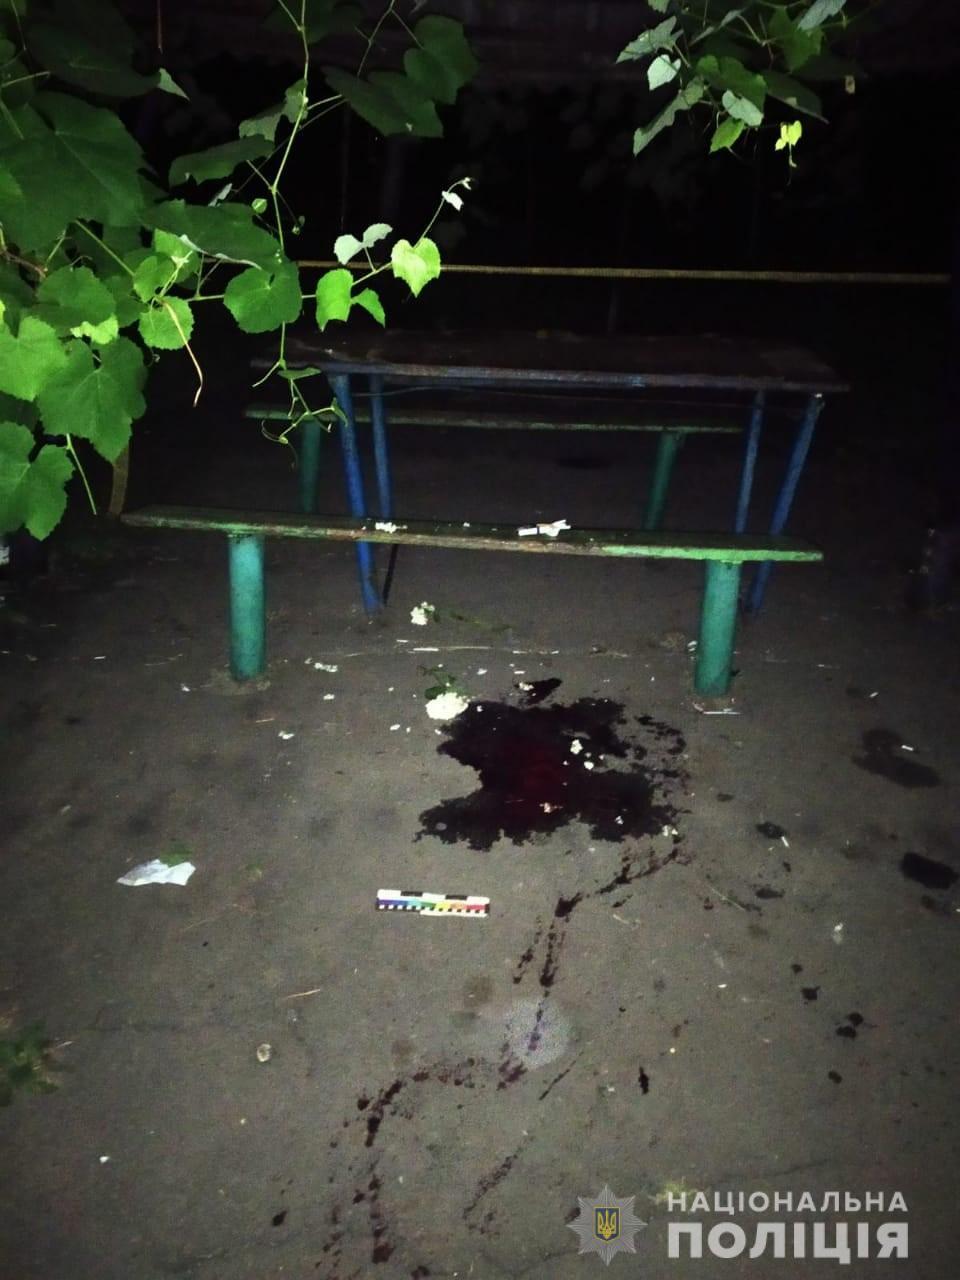 Мужчина погиб от взрыва гранаты